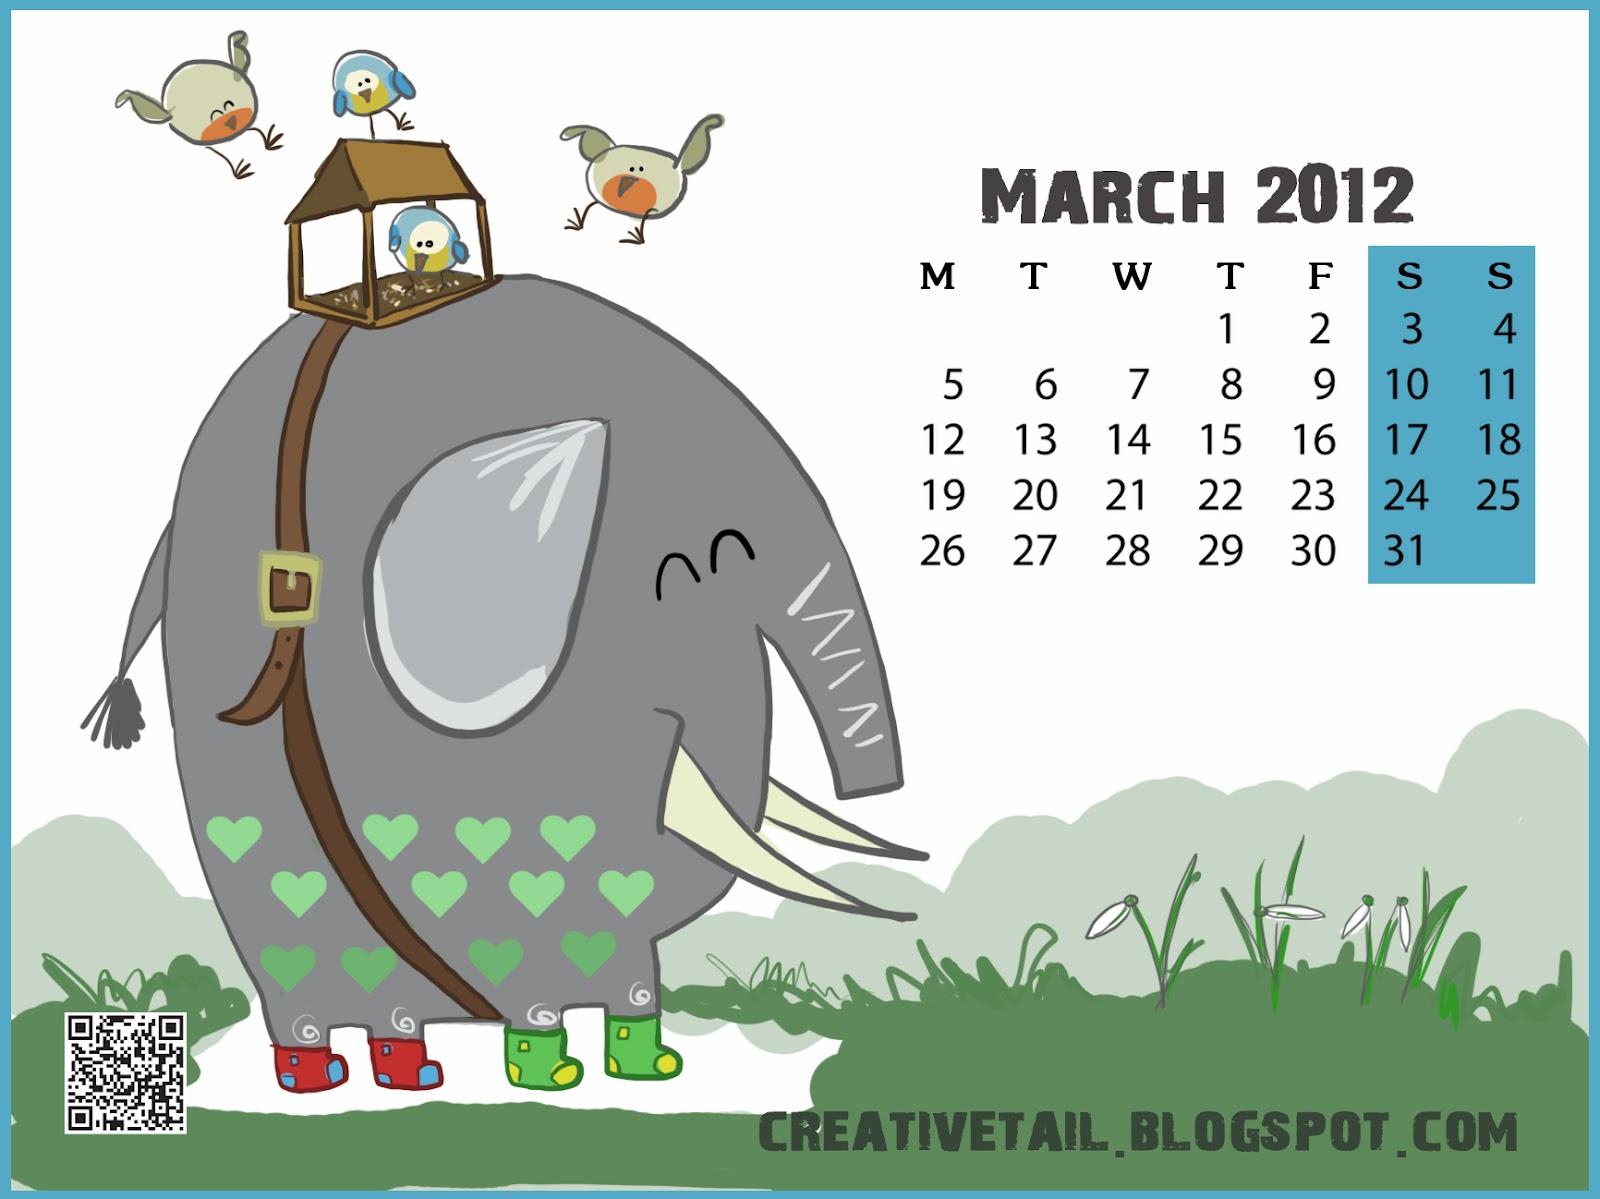 http://3.bp.blogspot.com/-bHKoiZbGglg/T0oPE_KuQhI/AAAAAAAADrU/1CVkOxeZnVg/s1600/March+2012.jpg